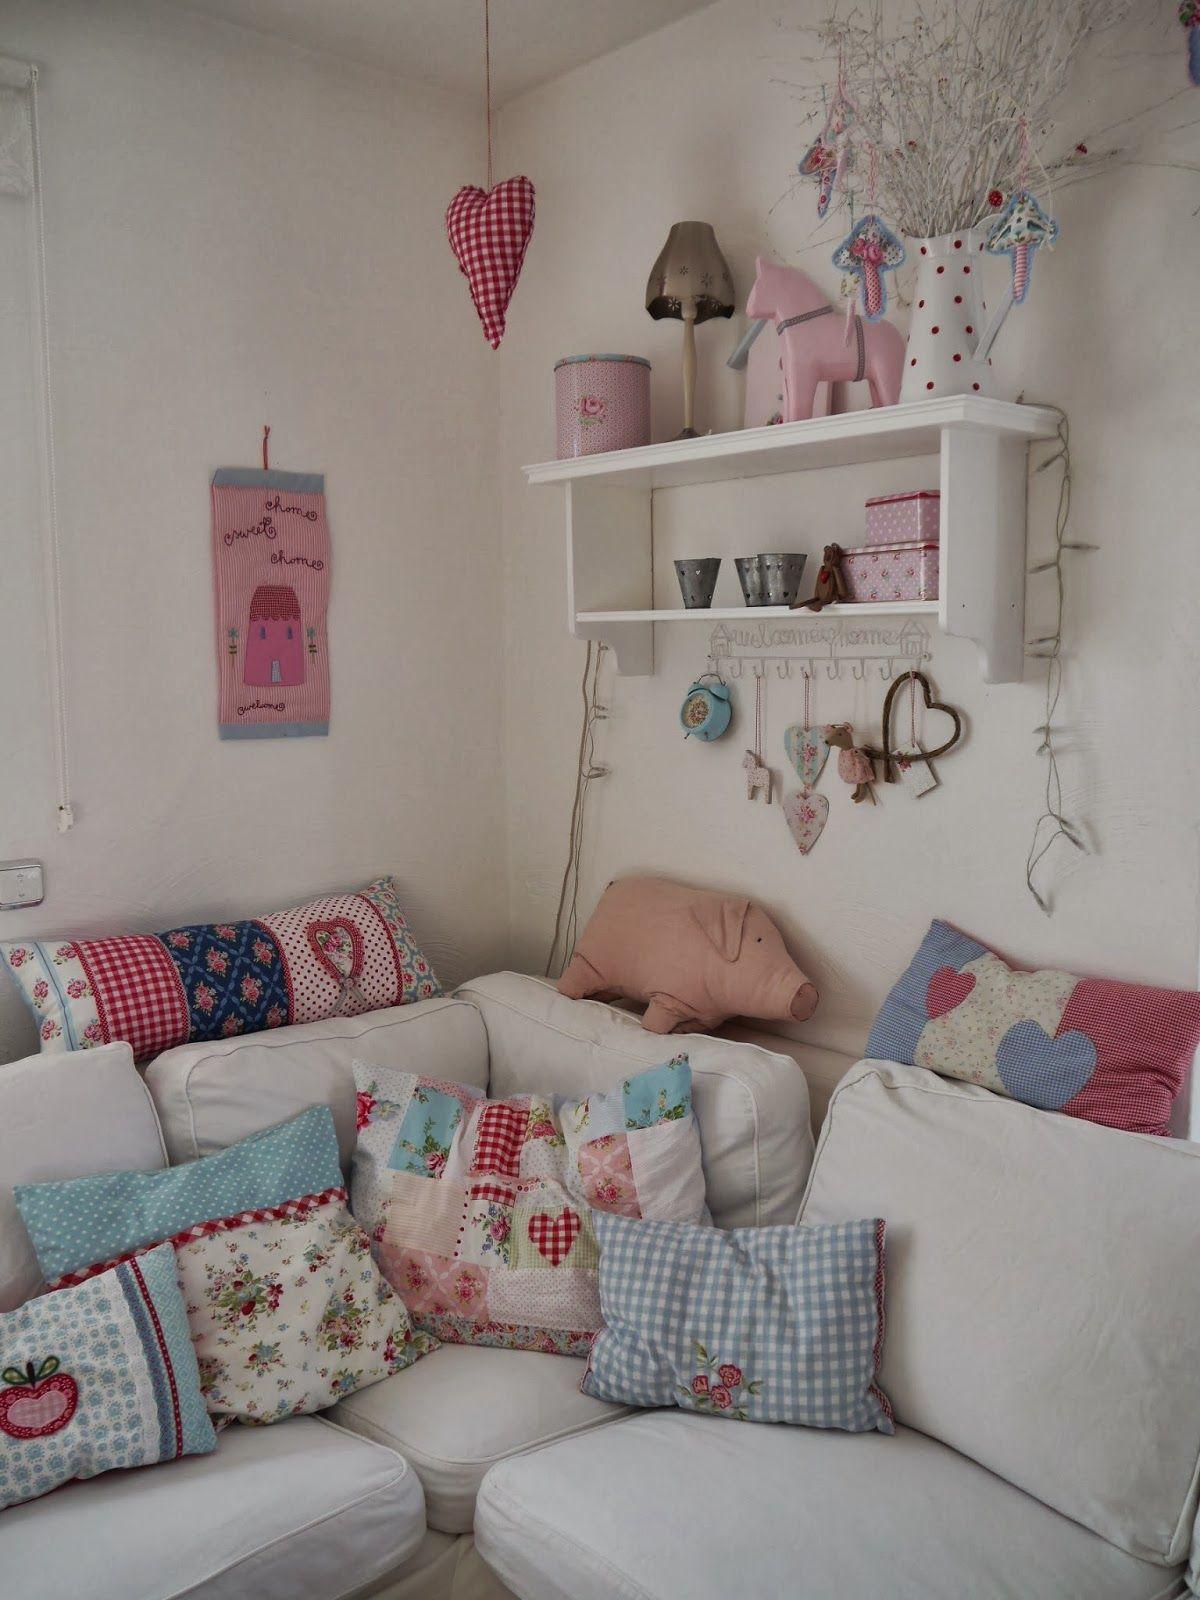 lila lavendel lila lavendel in 2019 pinterest shabby wohnideen und wohnzimmer. Black Bedroom Furniture Sets. Home Design Ideas